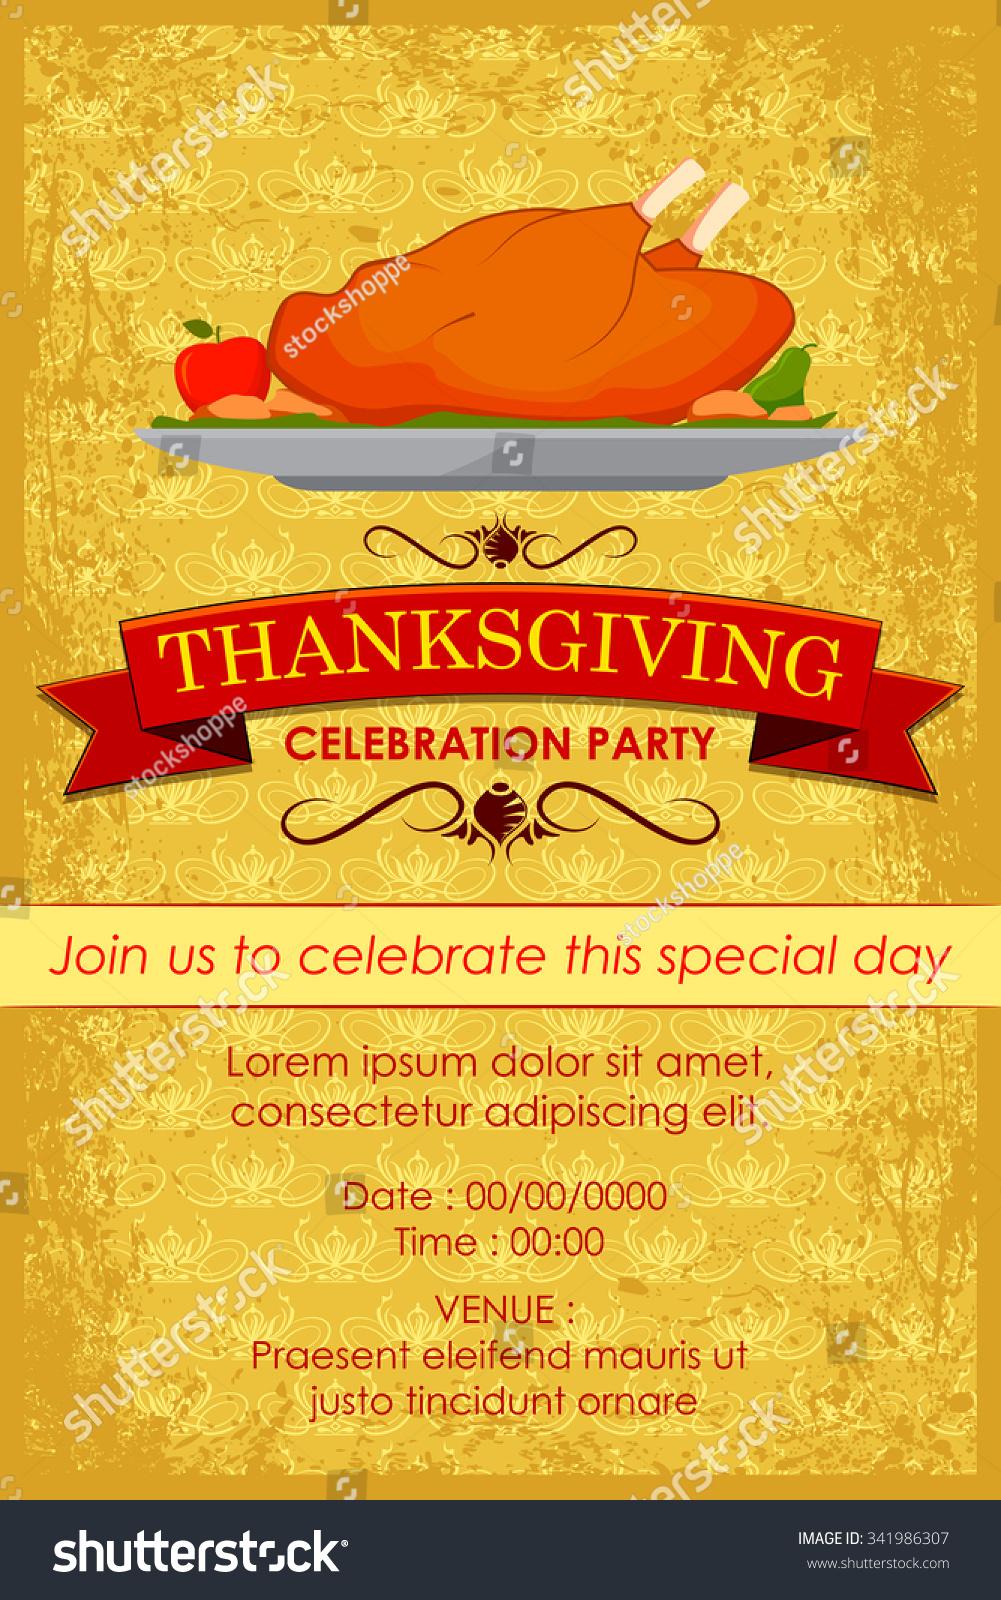 Vector Illustration Happy Thanksgiving Party Invitation Stock Vector ...